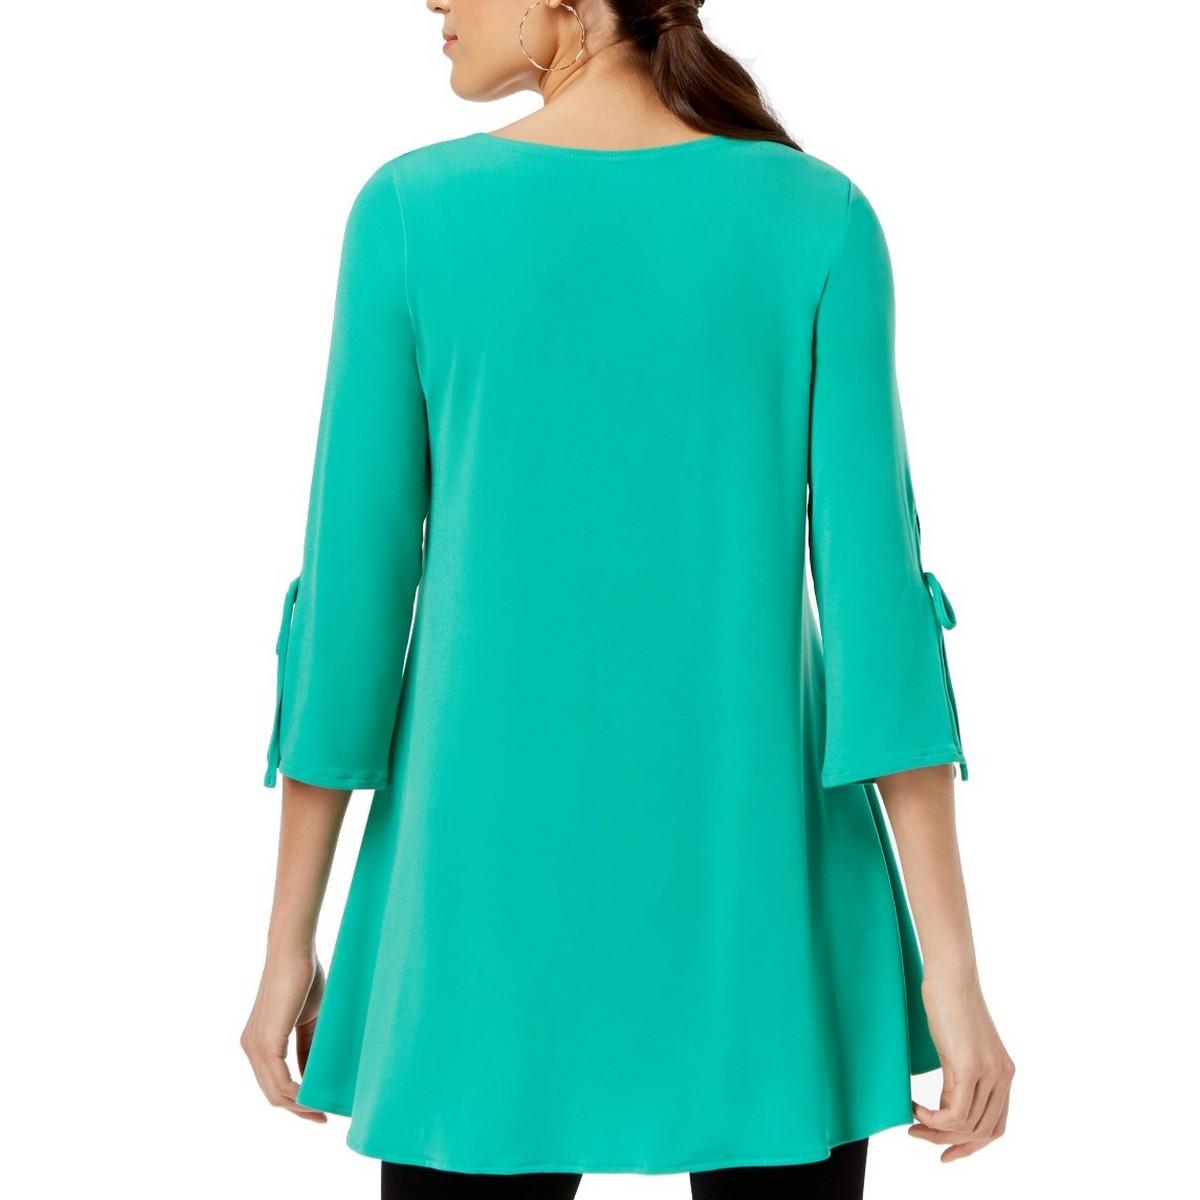 ALFANI-NEW-Women-039-s-Asymmetrical-Tie-sleeve-Swing-Blouse-Shirt-Top-TEDO thumbnail 4